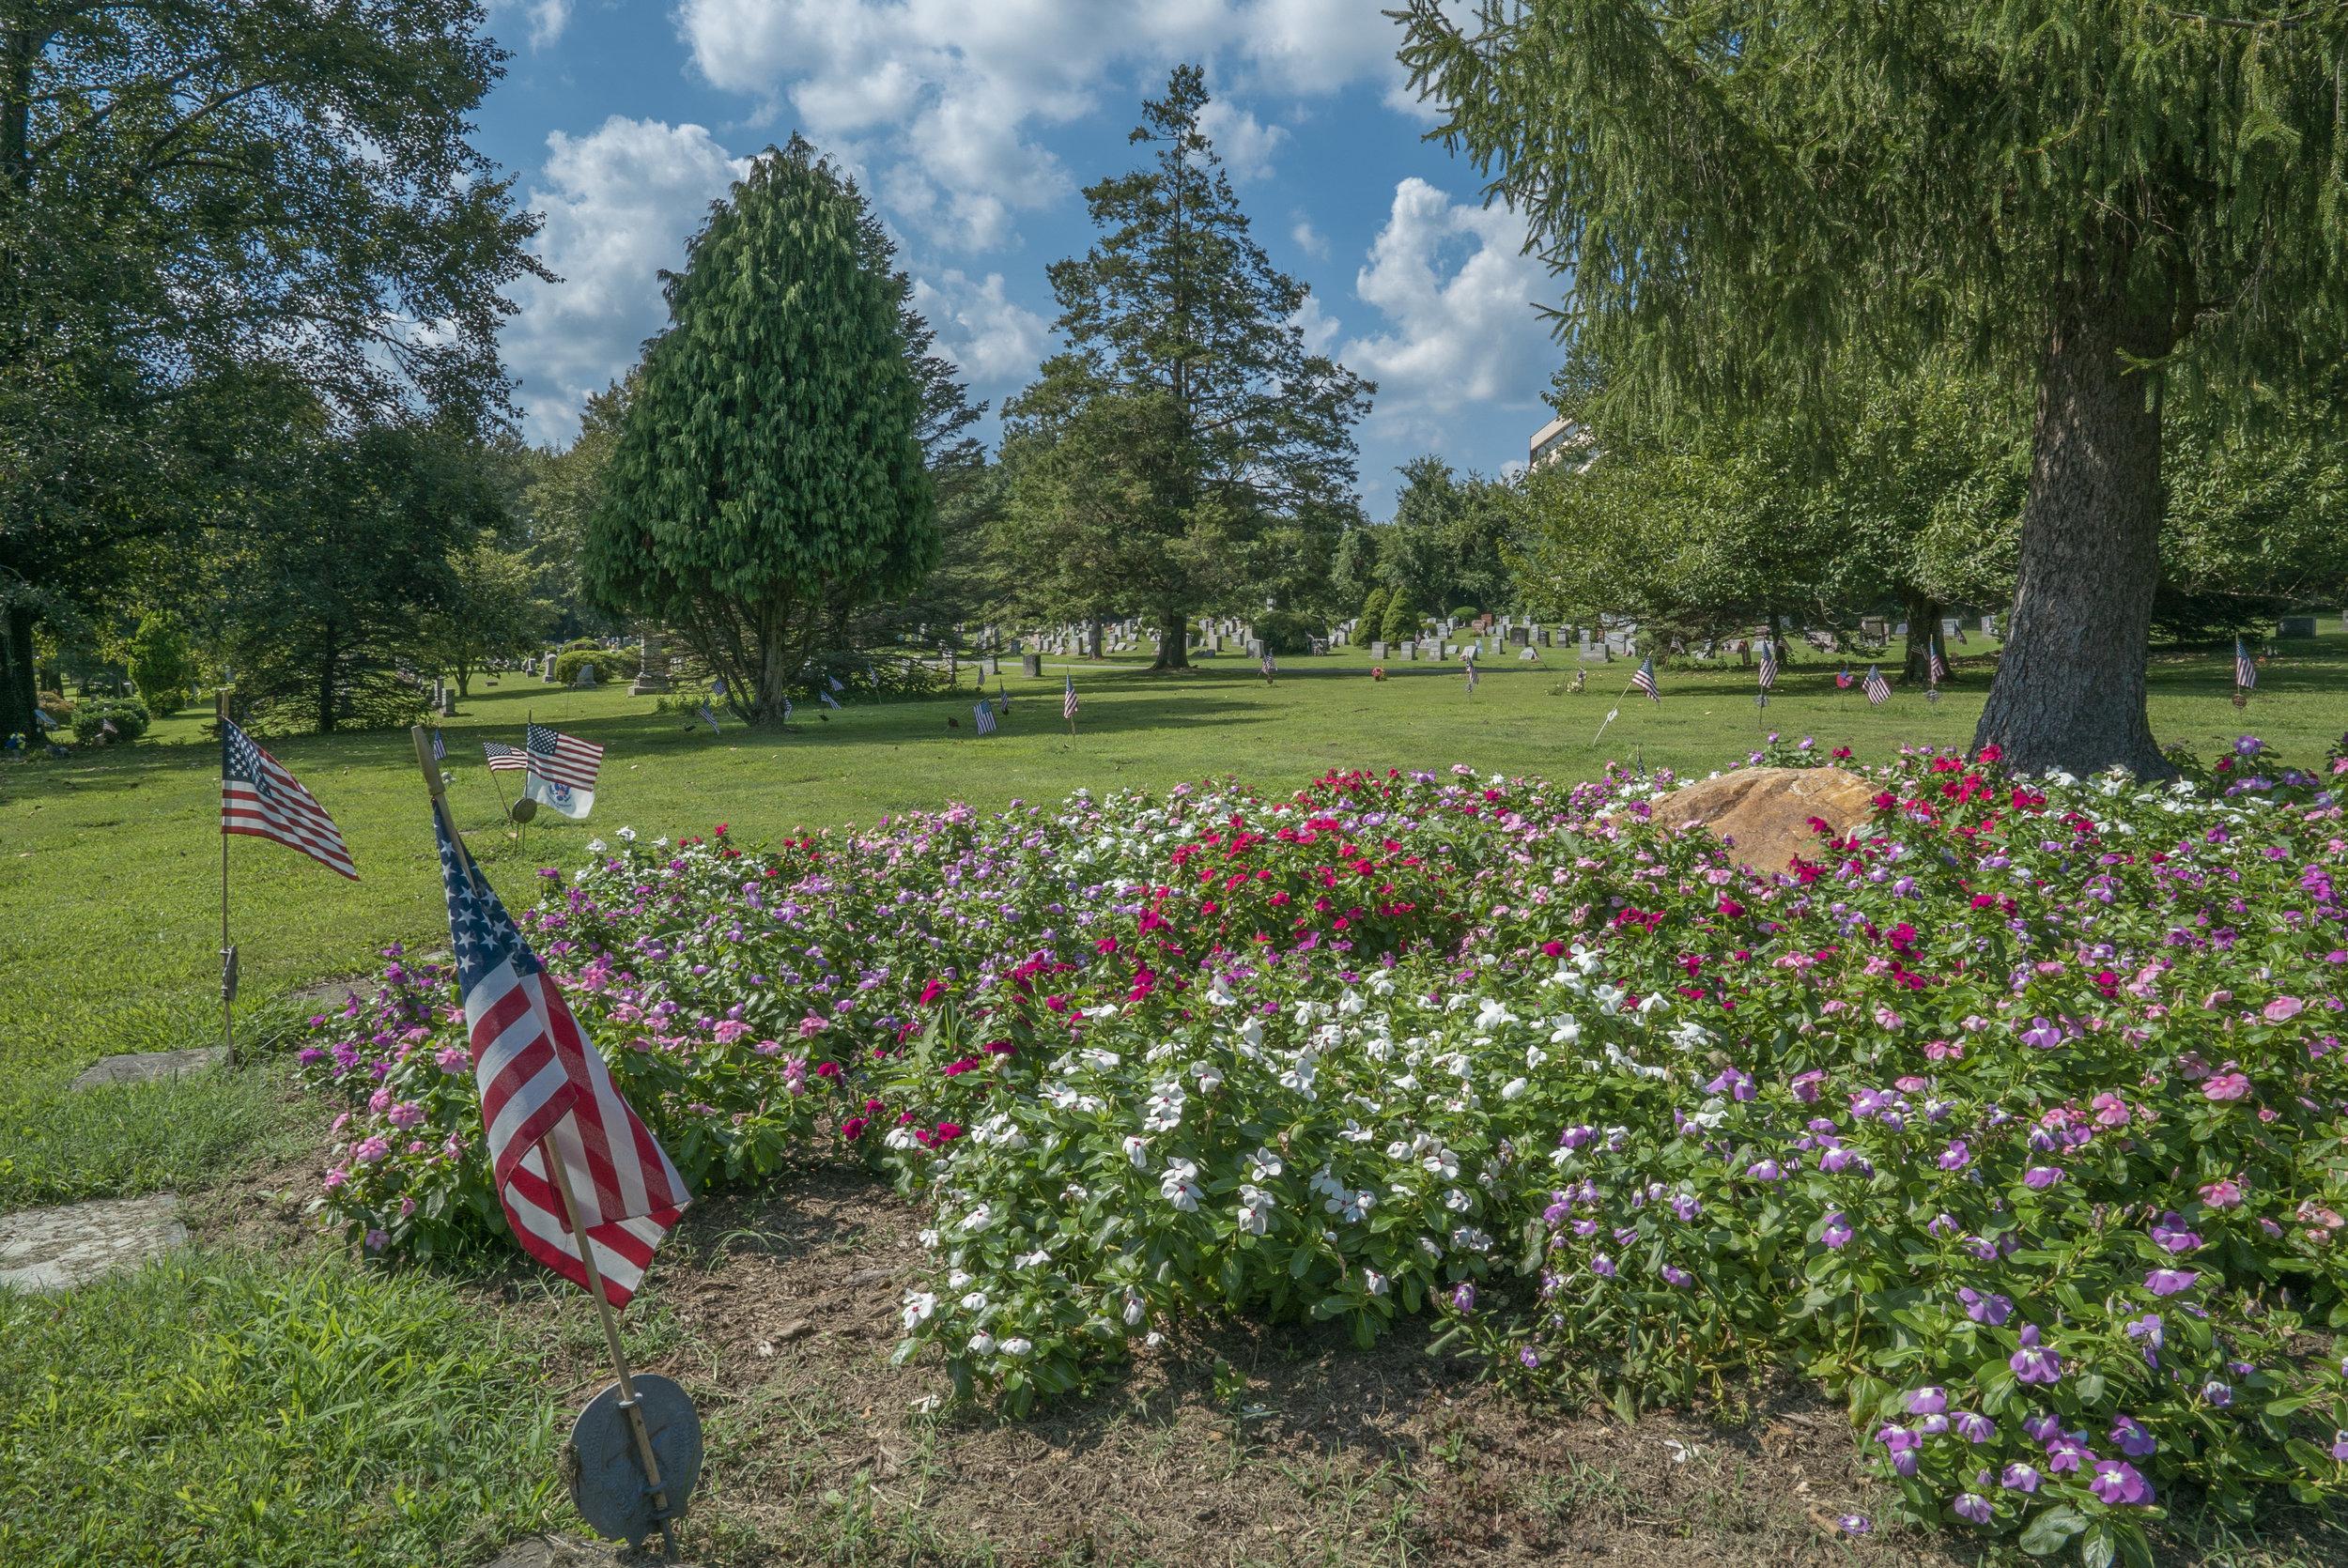 Media Cemetery, Delaware County, Pennsylvania. August 2019.